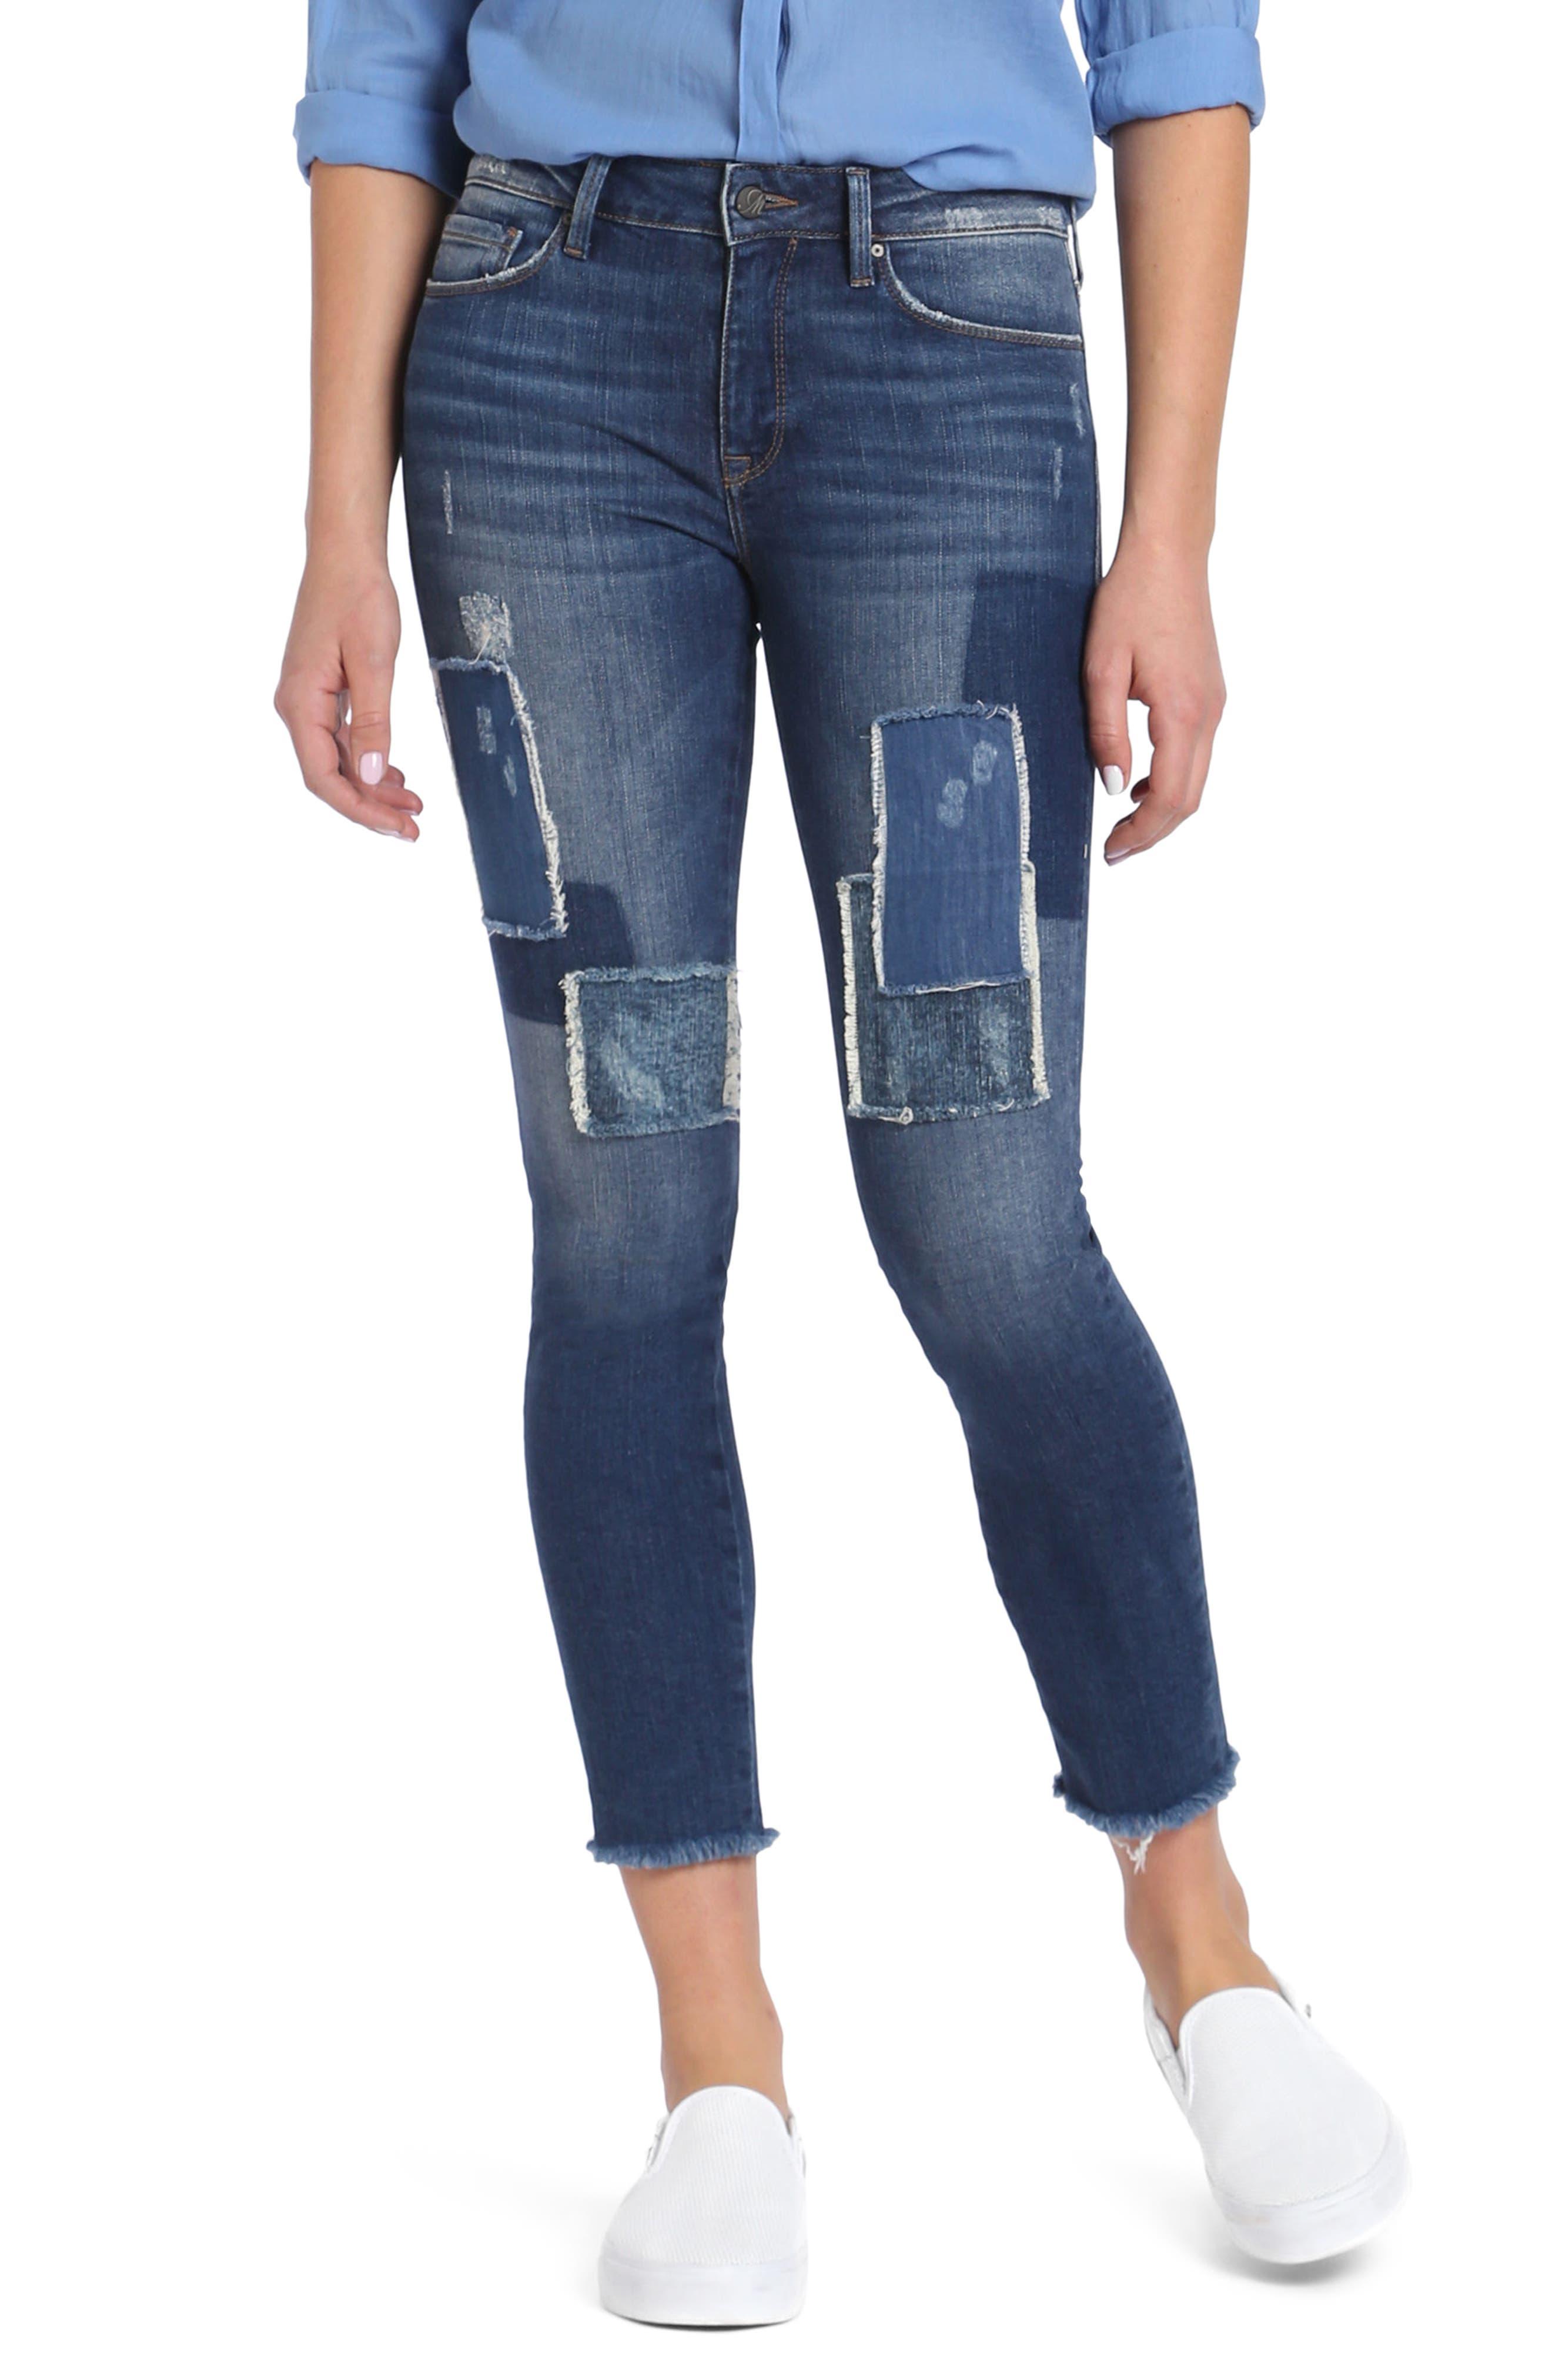 Mavi Jeans Adriana Patched Stretch Skinny Jeans (Indigo Patched Vintage)